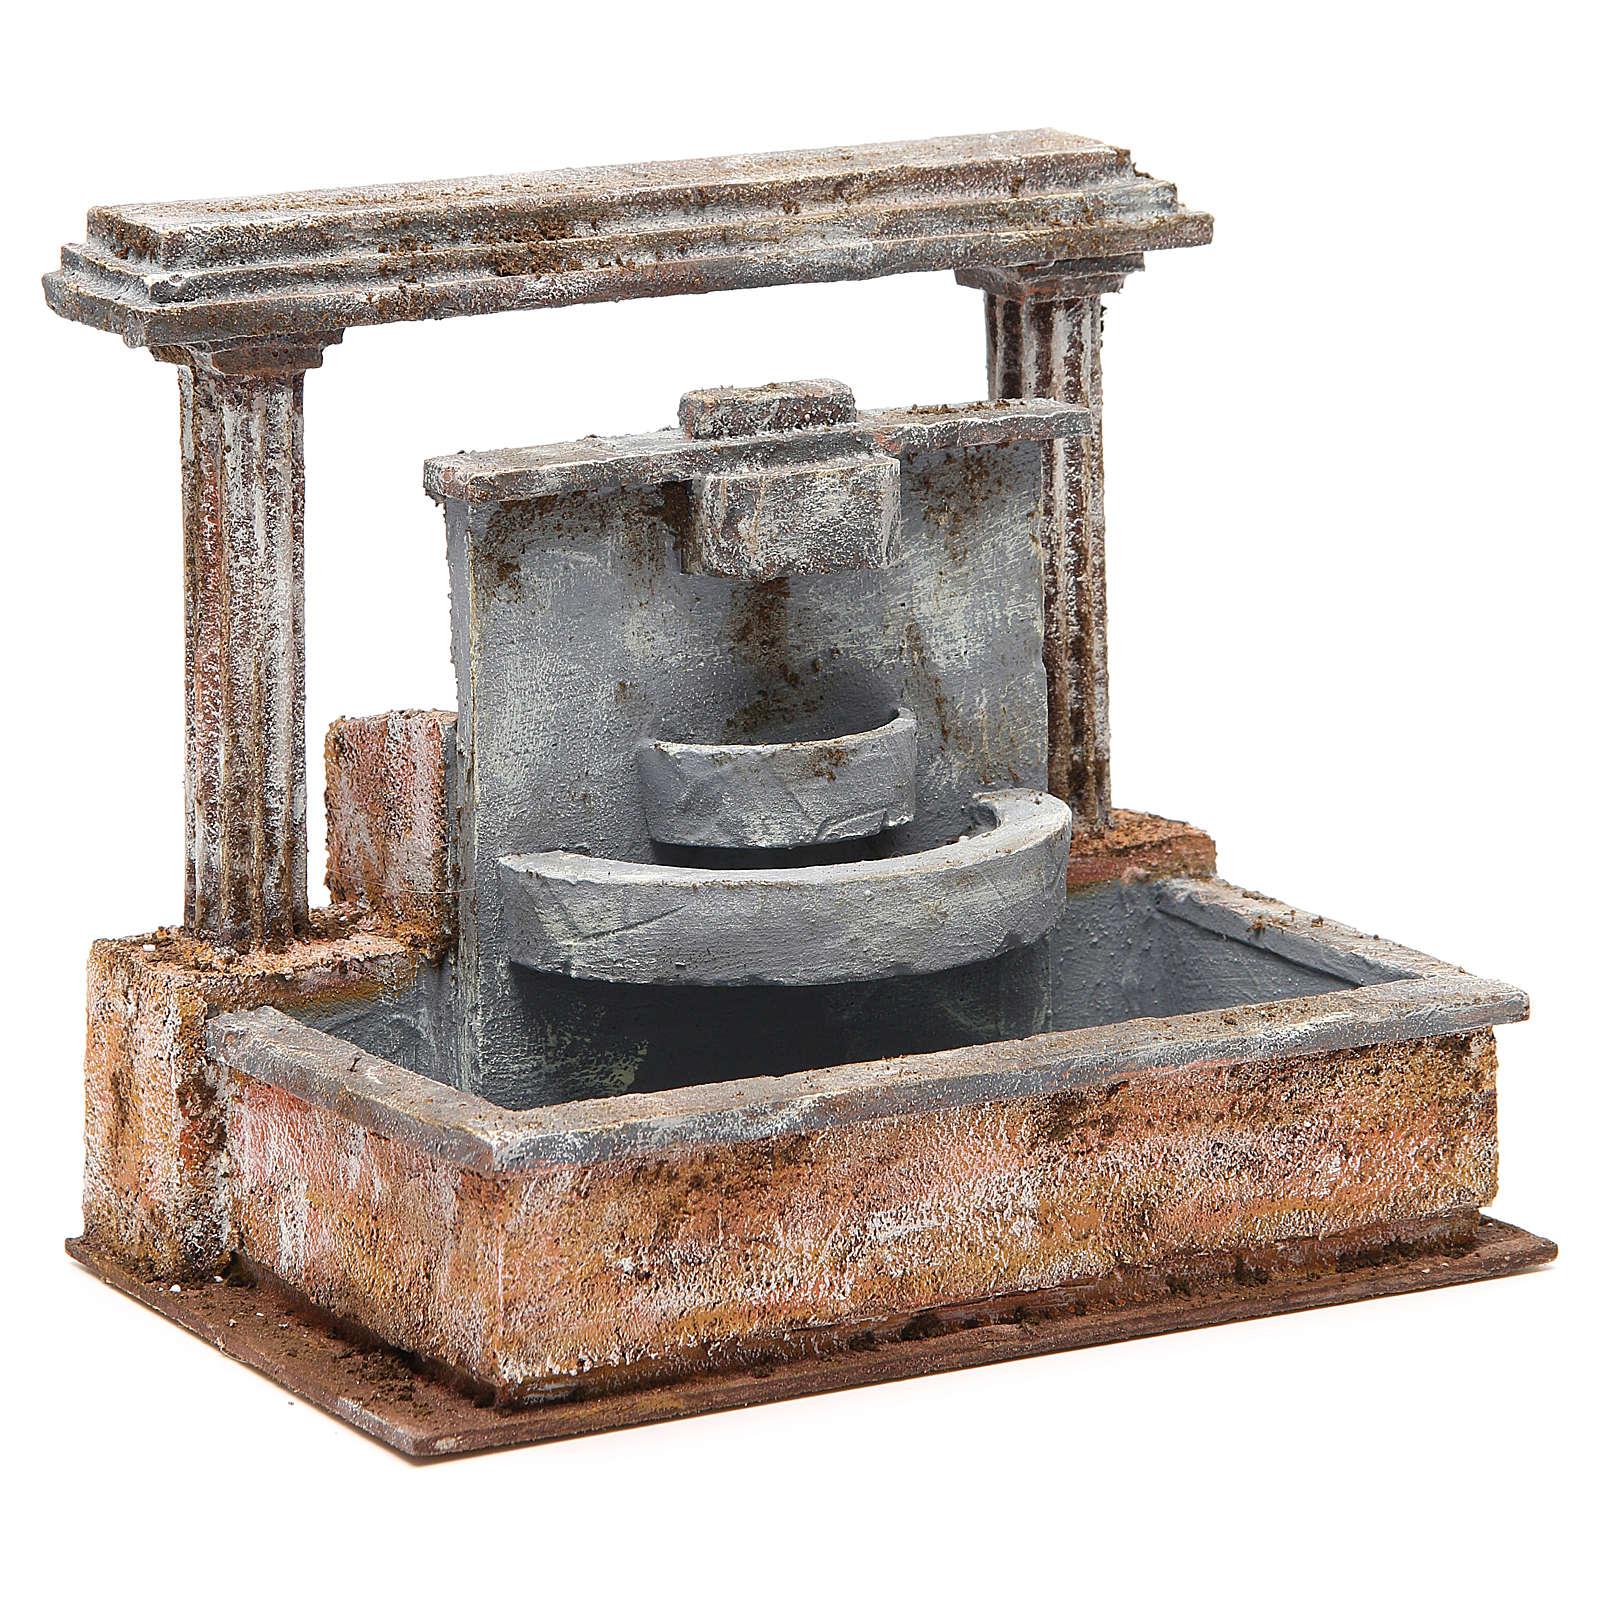 Fontana presepe 2 colonne effetto cascata 20x25x15 cm 4